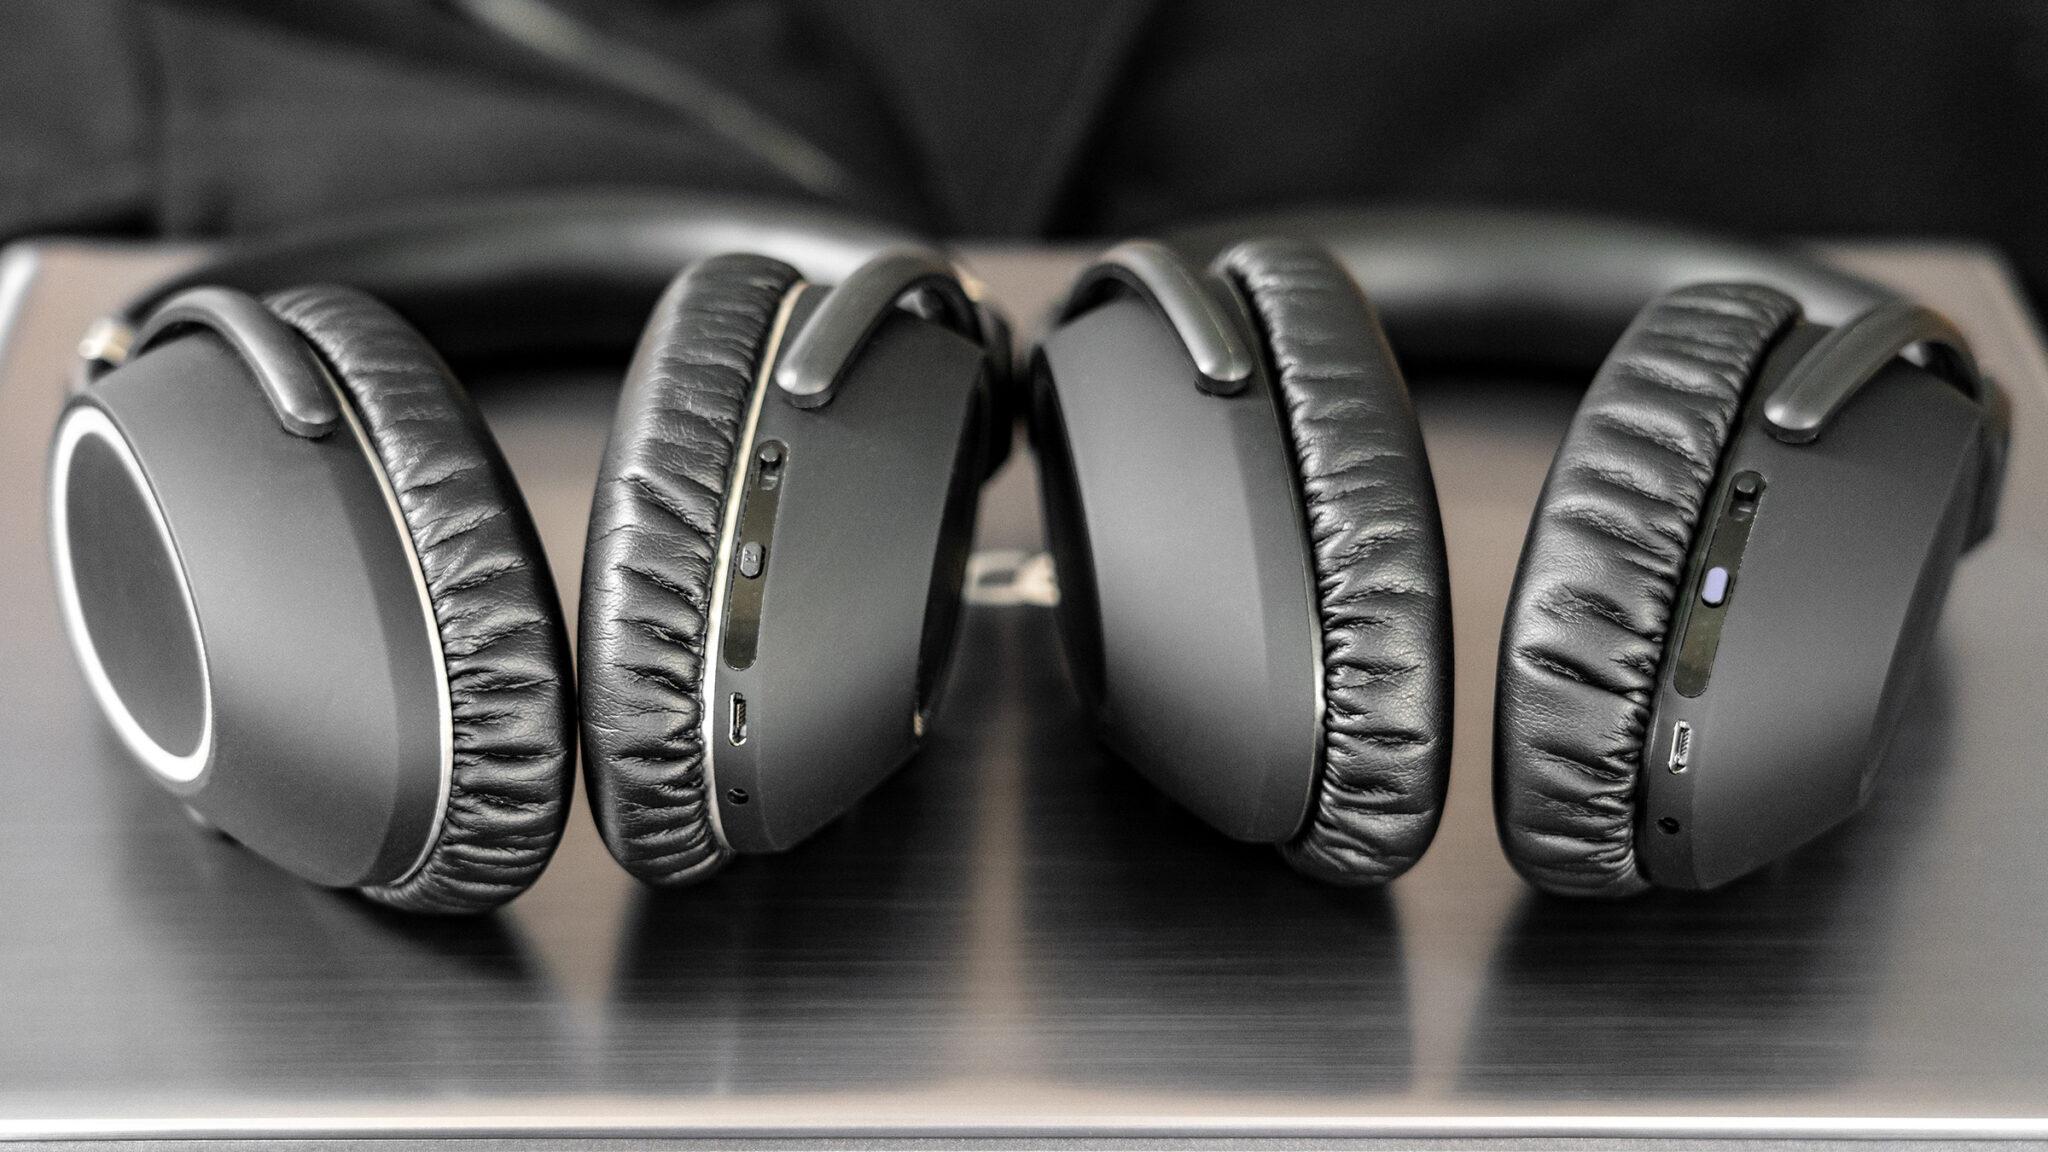 Sennheiser EPOS ADAPT 660 ANC Headset Vergleich PXC 550-I